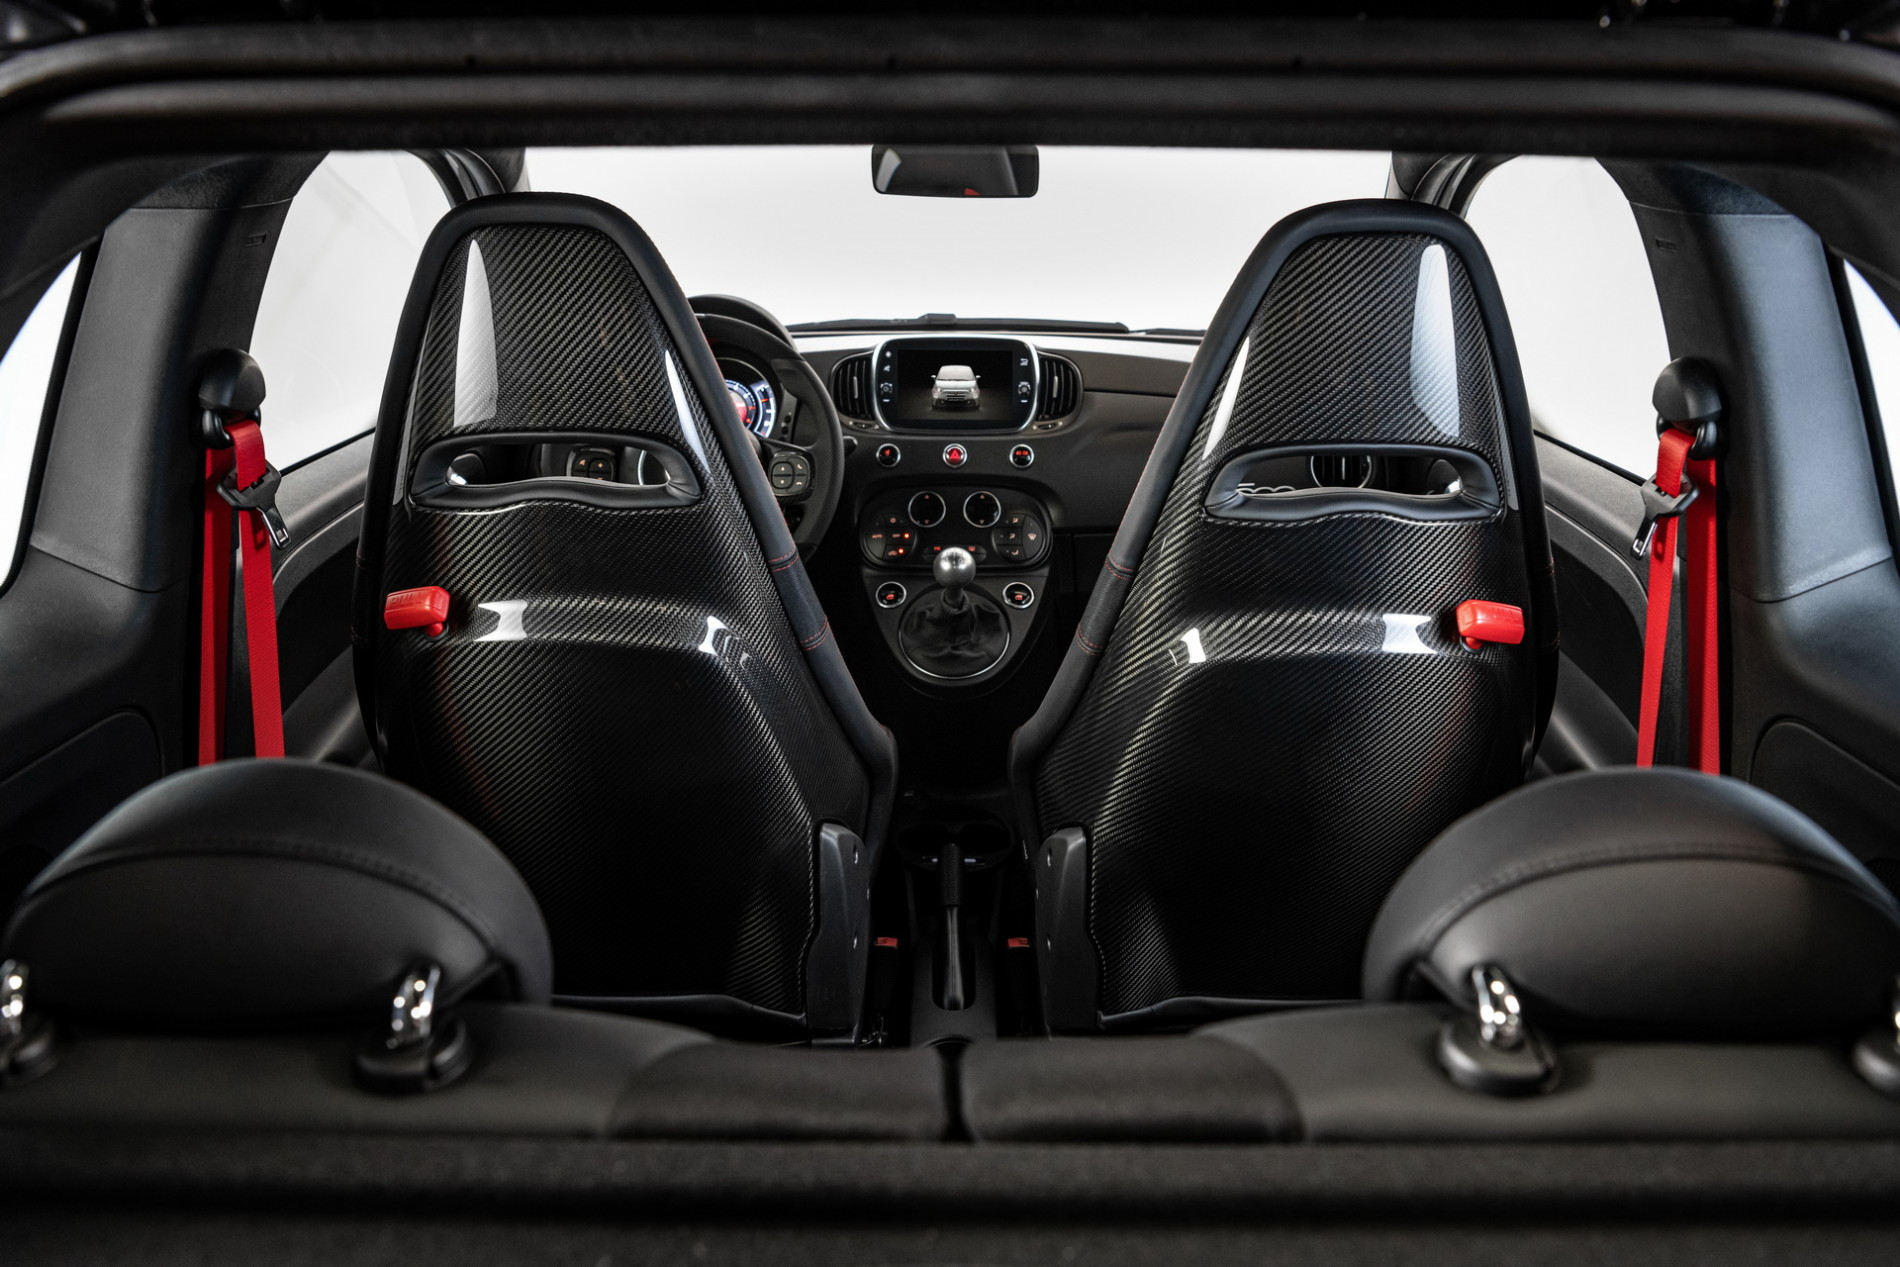 Abarth 595 facelift - Abarth 595 facelift